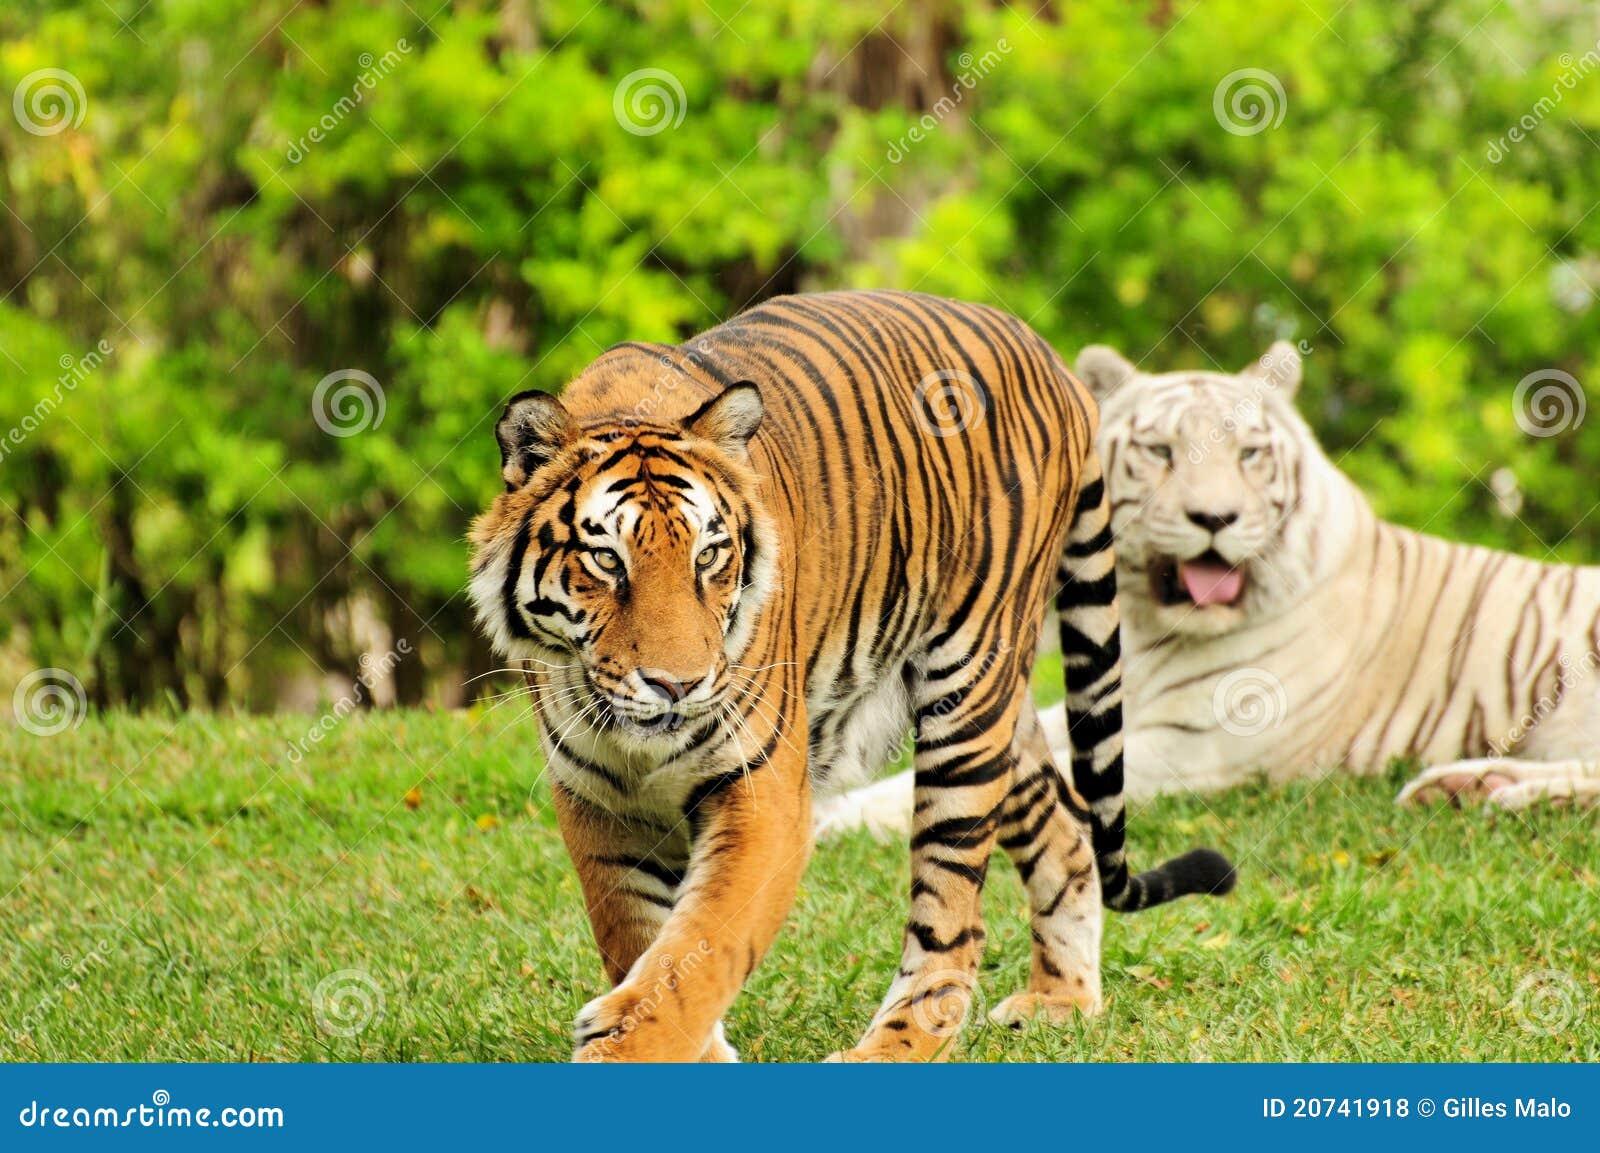 Tigre orange et tigre blanc photo stock image 20741918 - Images tigres gratuites ...